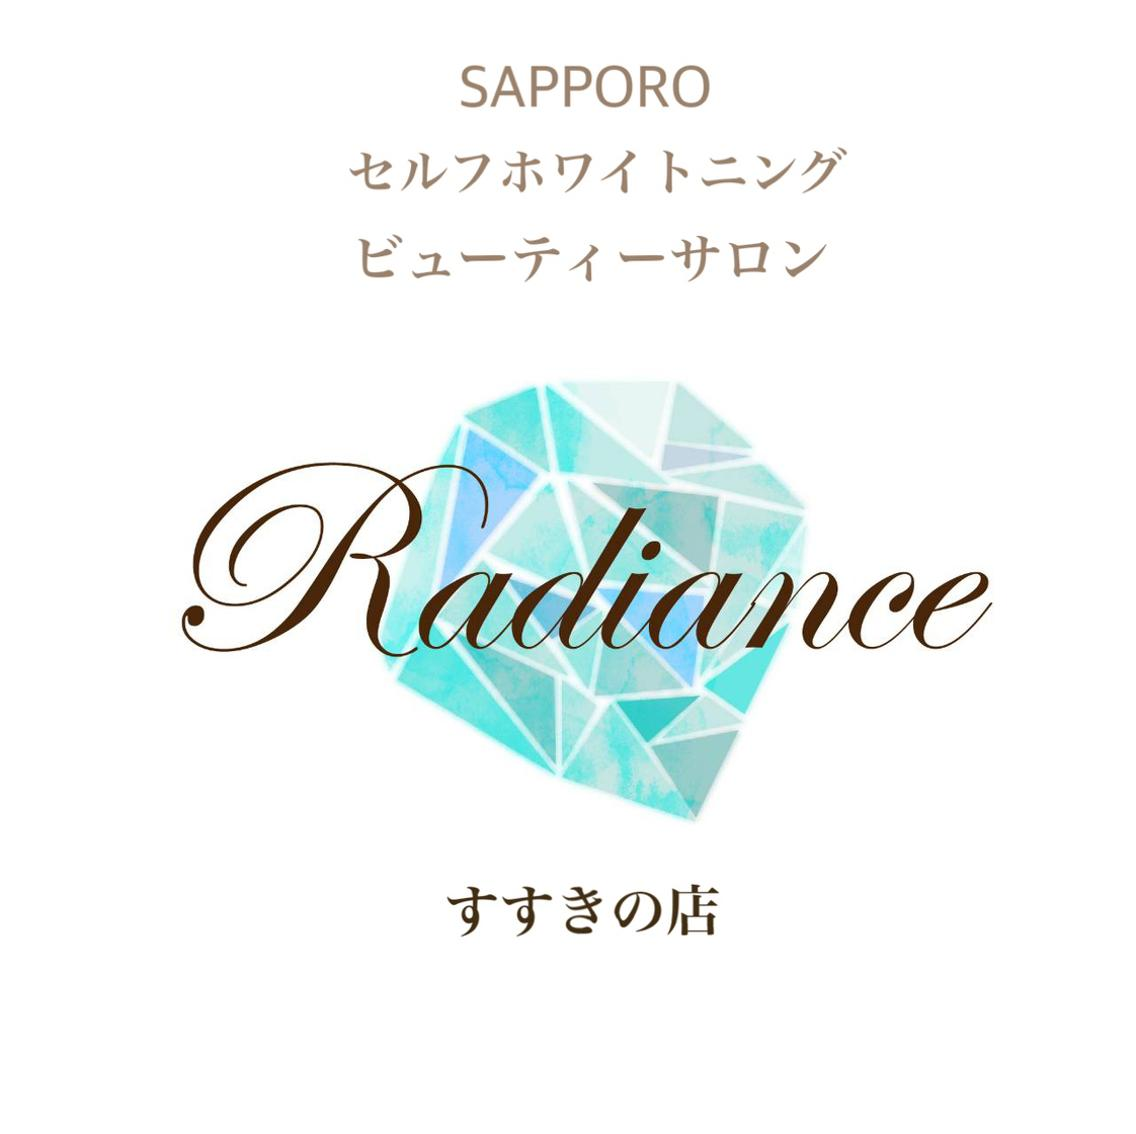 Radiance所属・Radiance(ラディアンス)の掲載